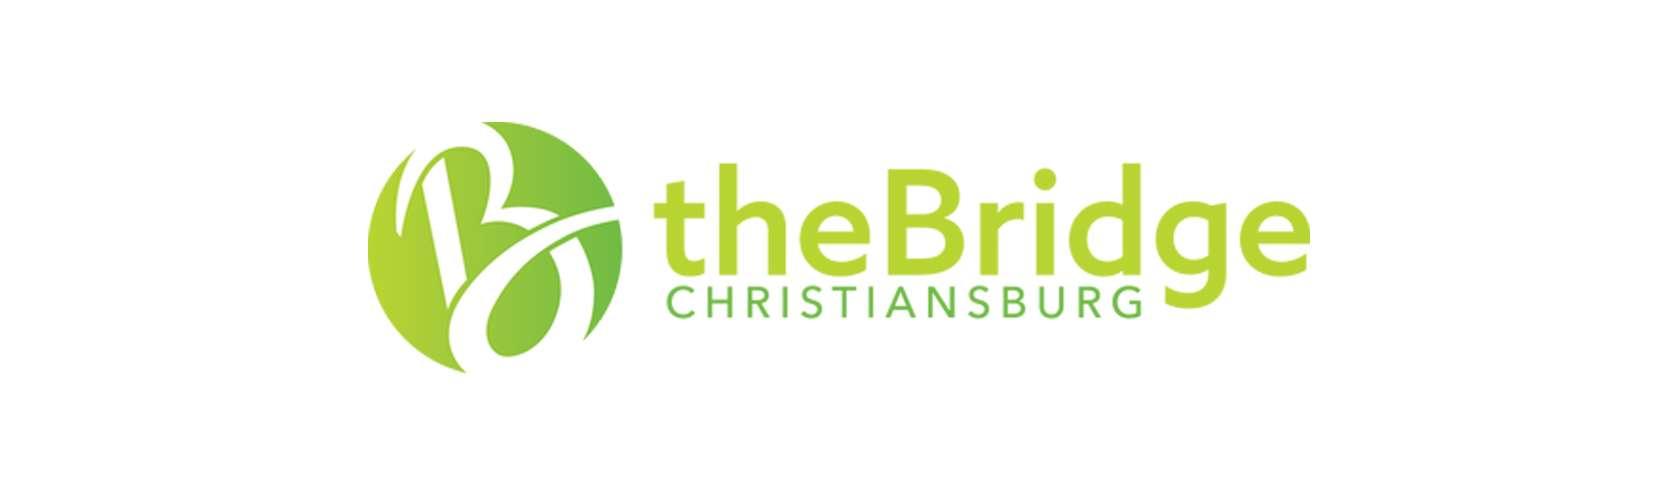 thebridge-church-christiansburg